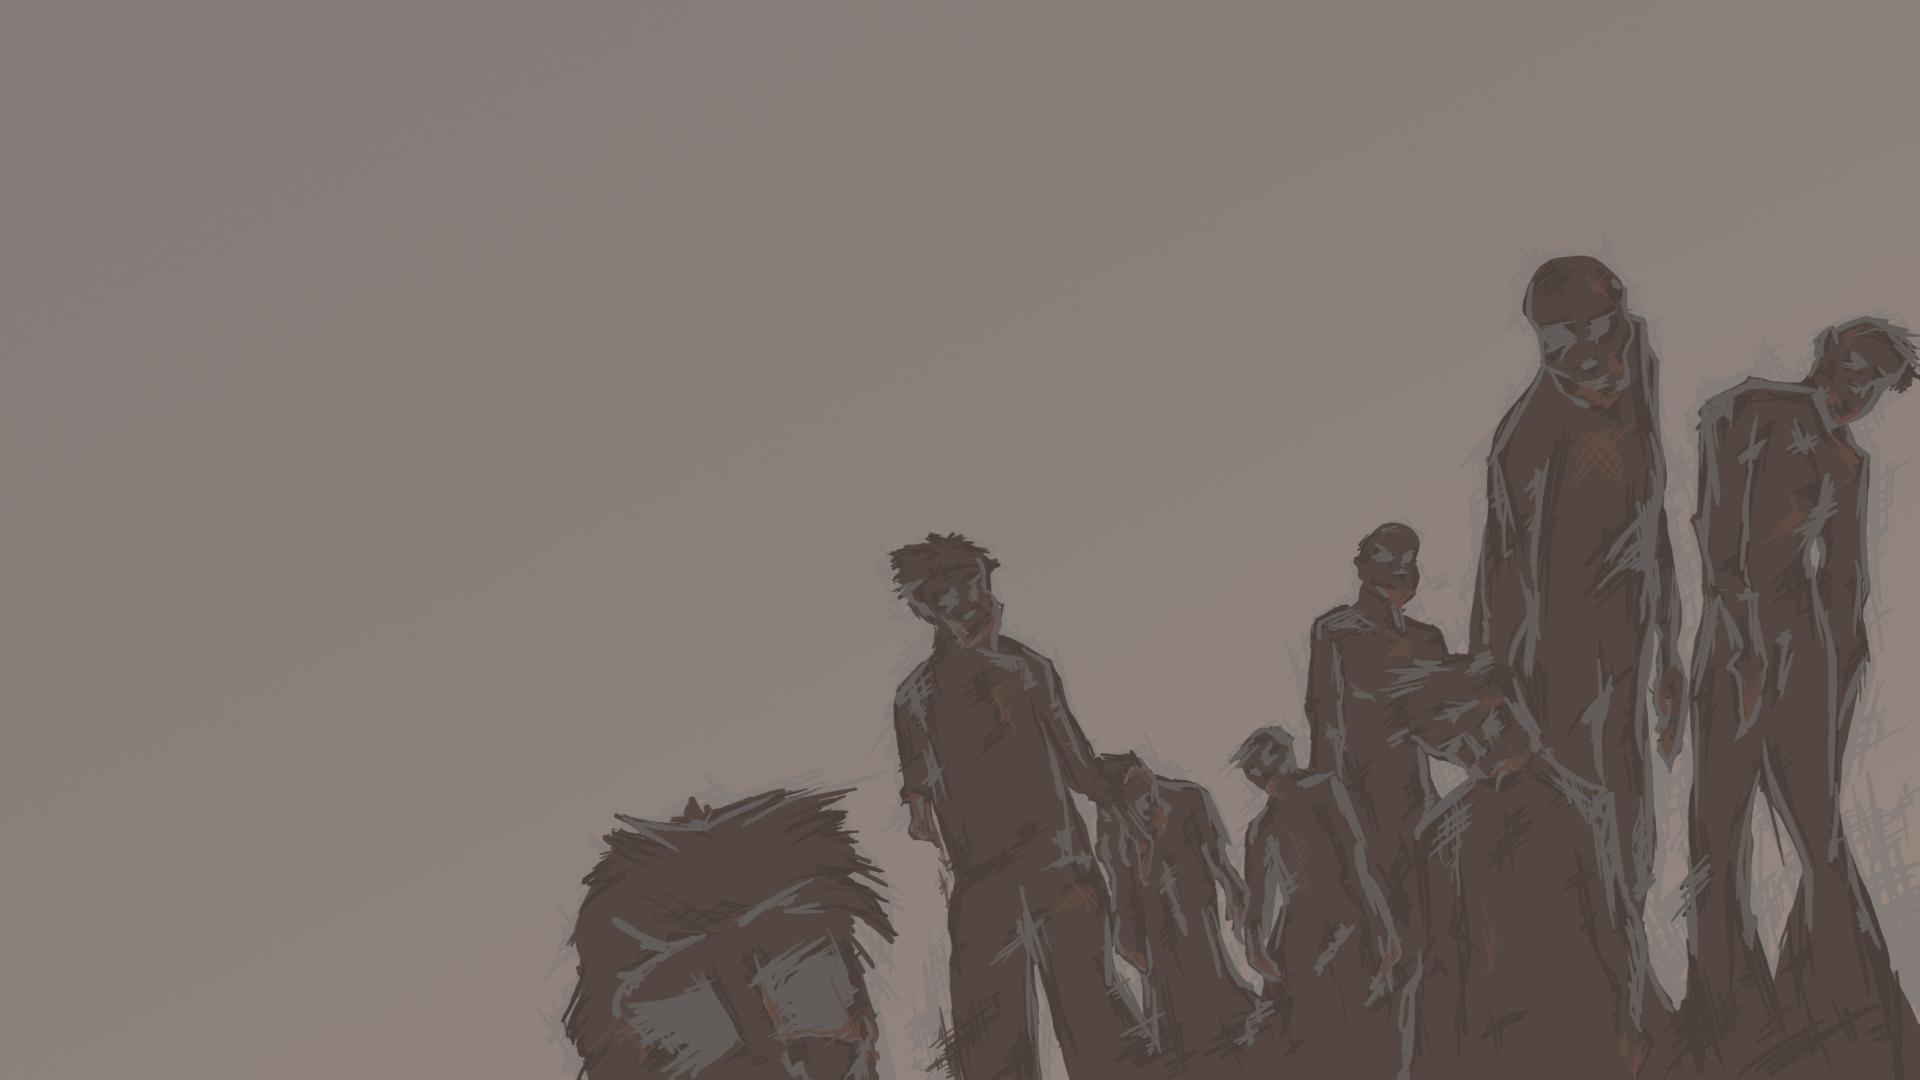 zombie horde wallpaper hd - photo #22